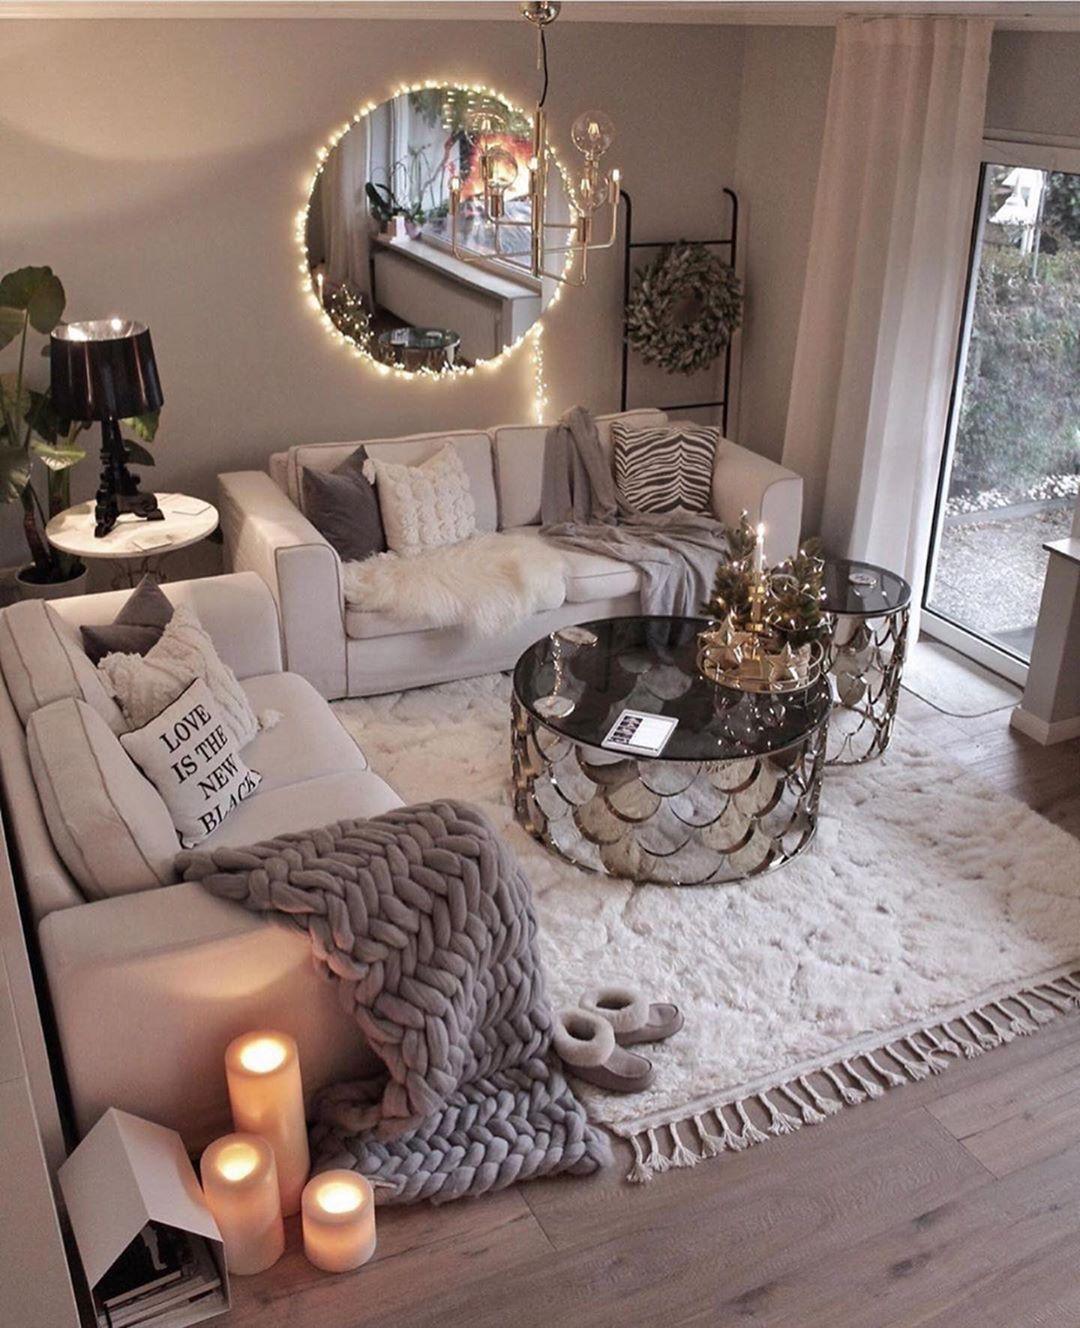 Stylist Taste On Instagram 1 2 3 4 5 Gozdee81 Interio Int Living Room Decor Apartment Living Room Decor Cozy Chic Living Room